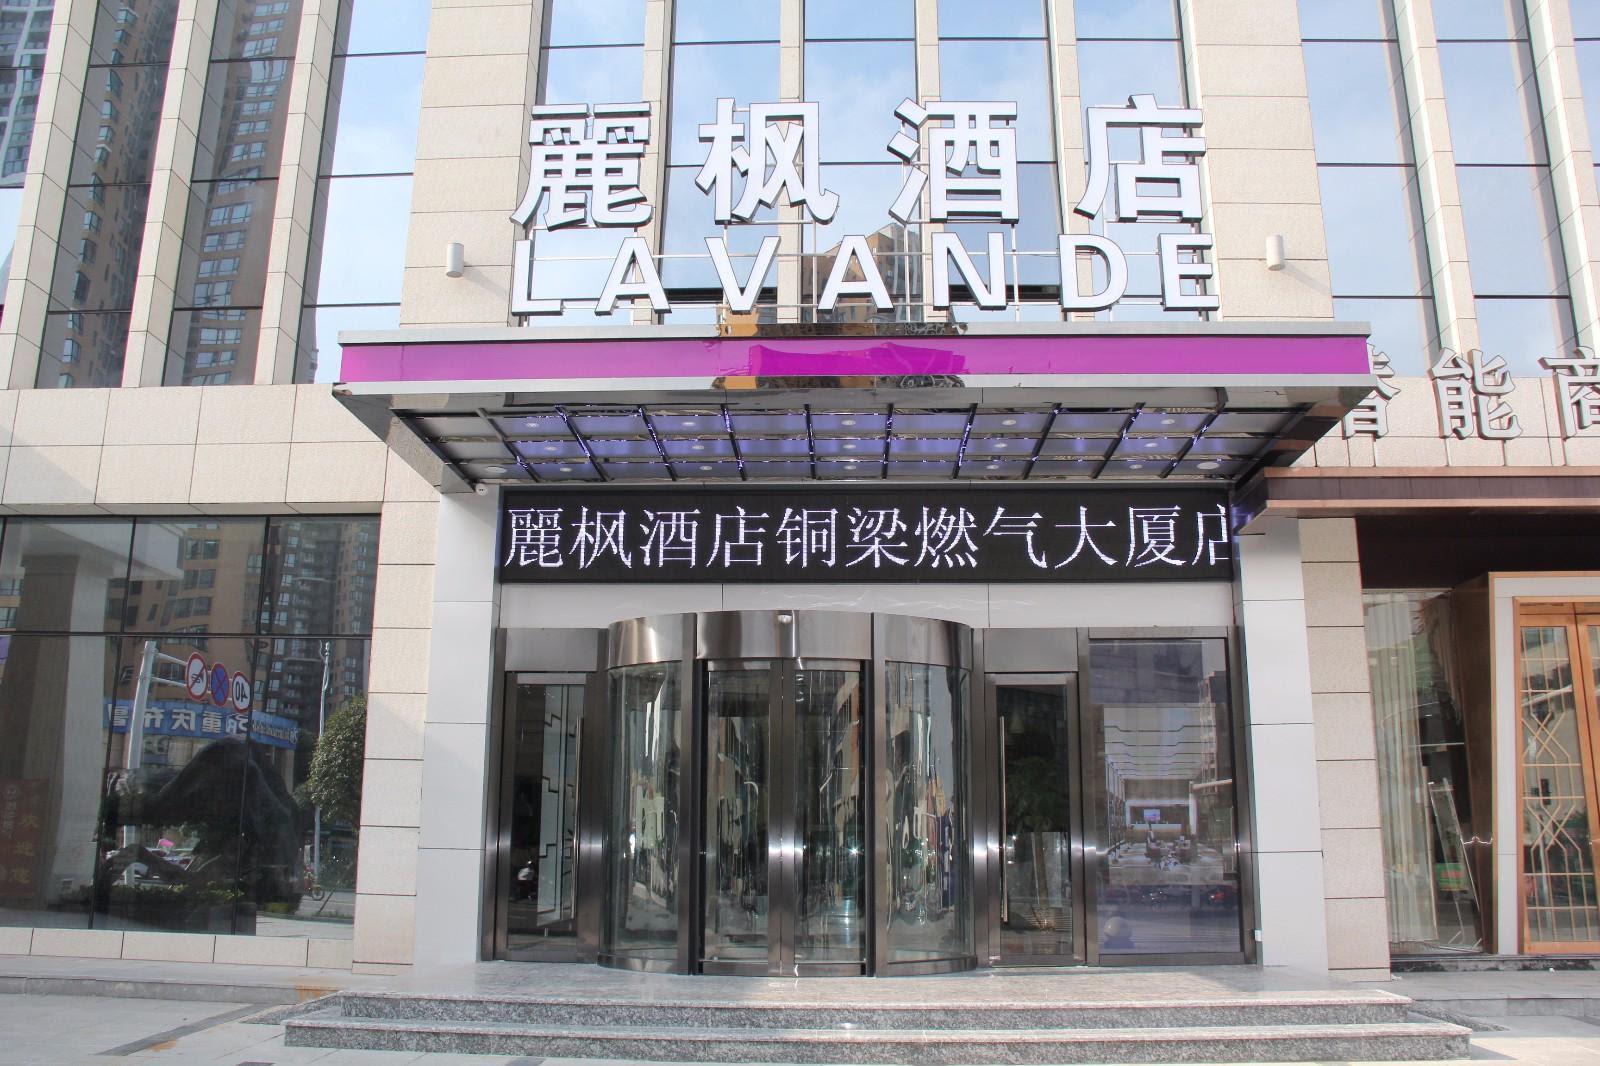 Lavande Hotel Chongqing Tongliang Gas Building Reviews